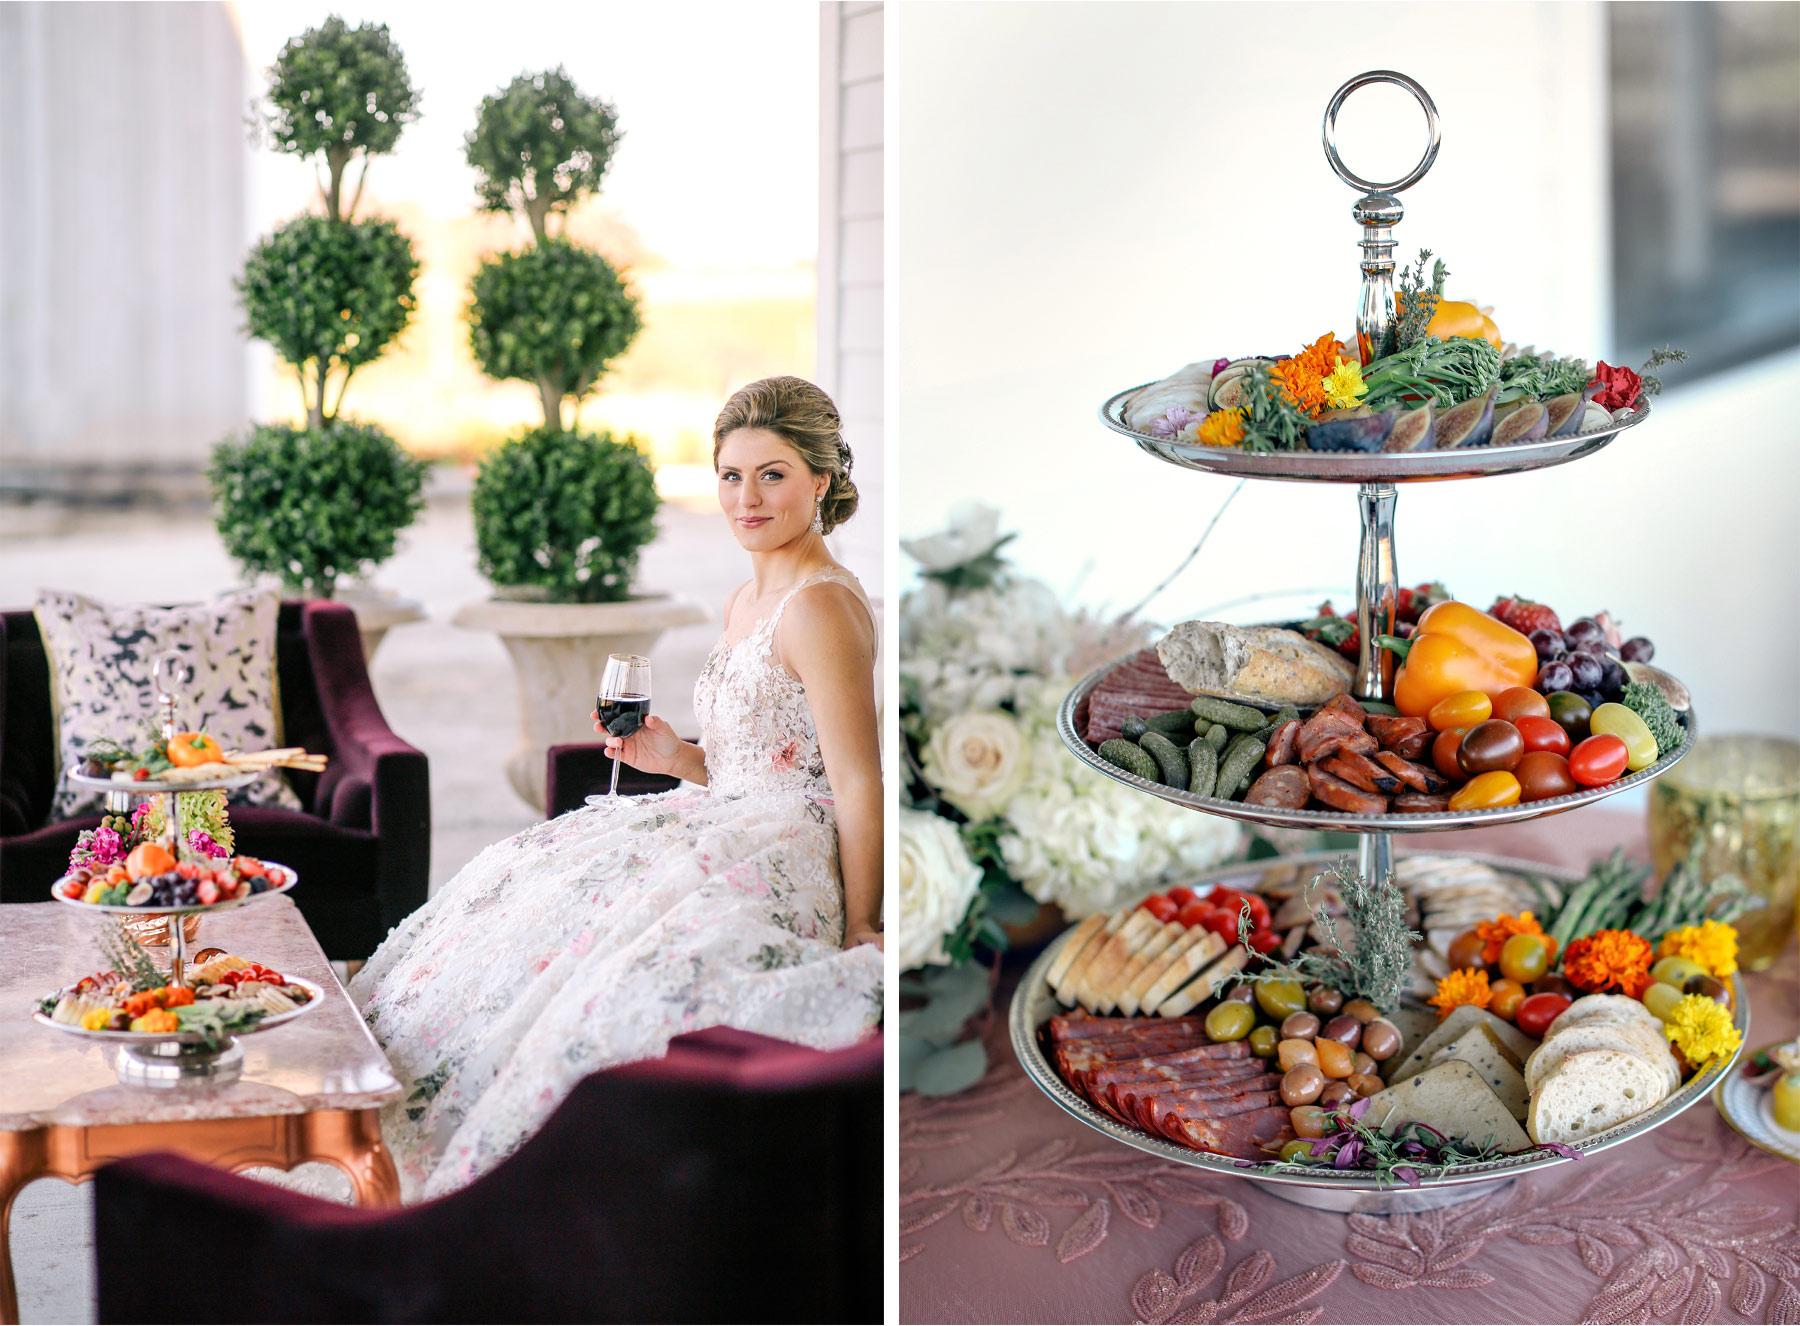 02-Ashery-Lane-Farm-Minneapolis-Minnesota-Wedding-Styled-Shoot-New-Venue-Barn-Orchard-Vineyard-Tea-Fruit-Wine.jpg